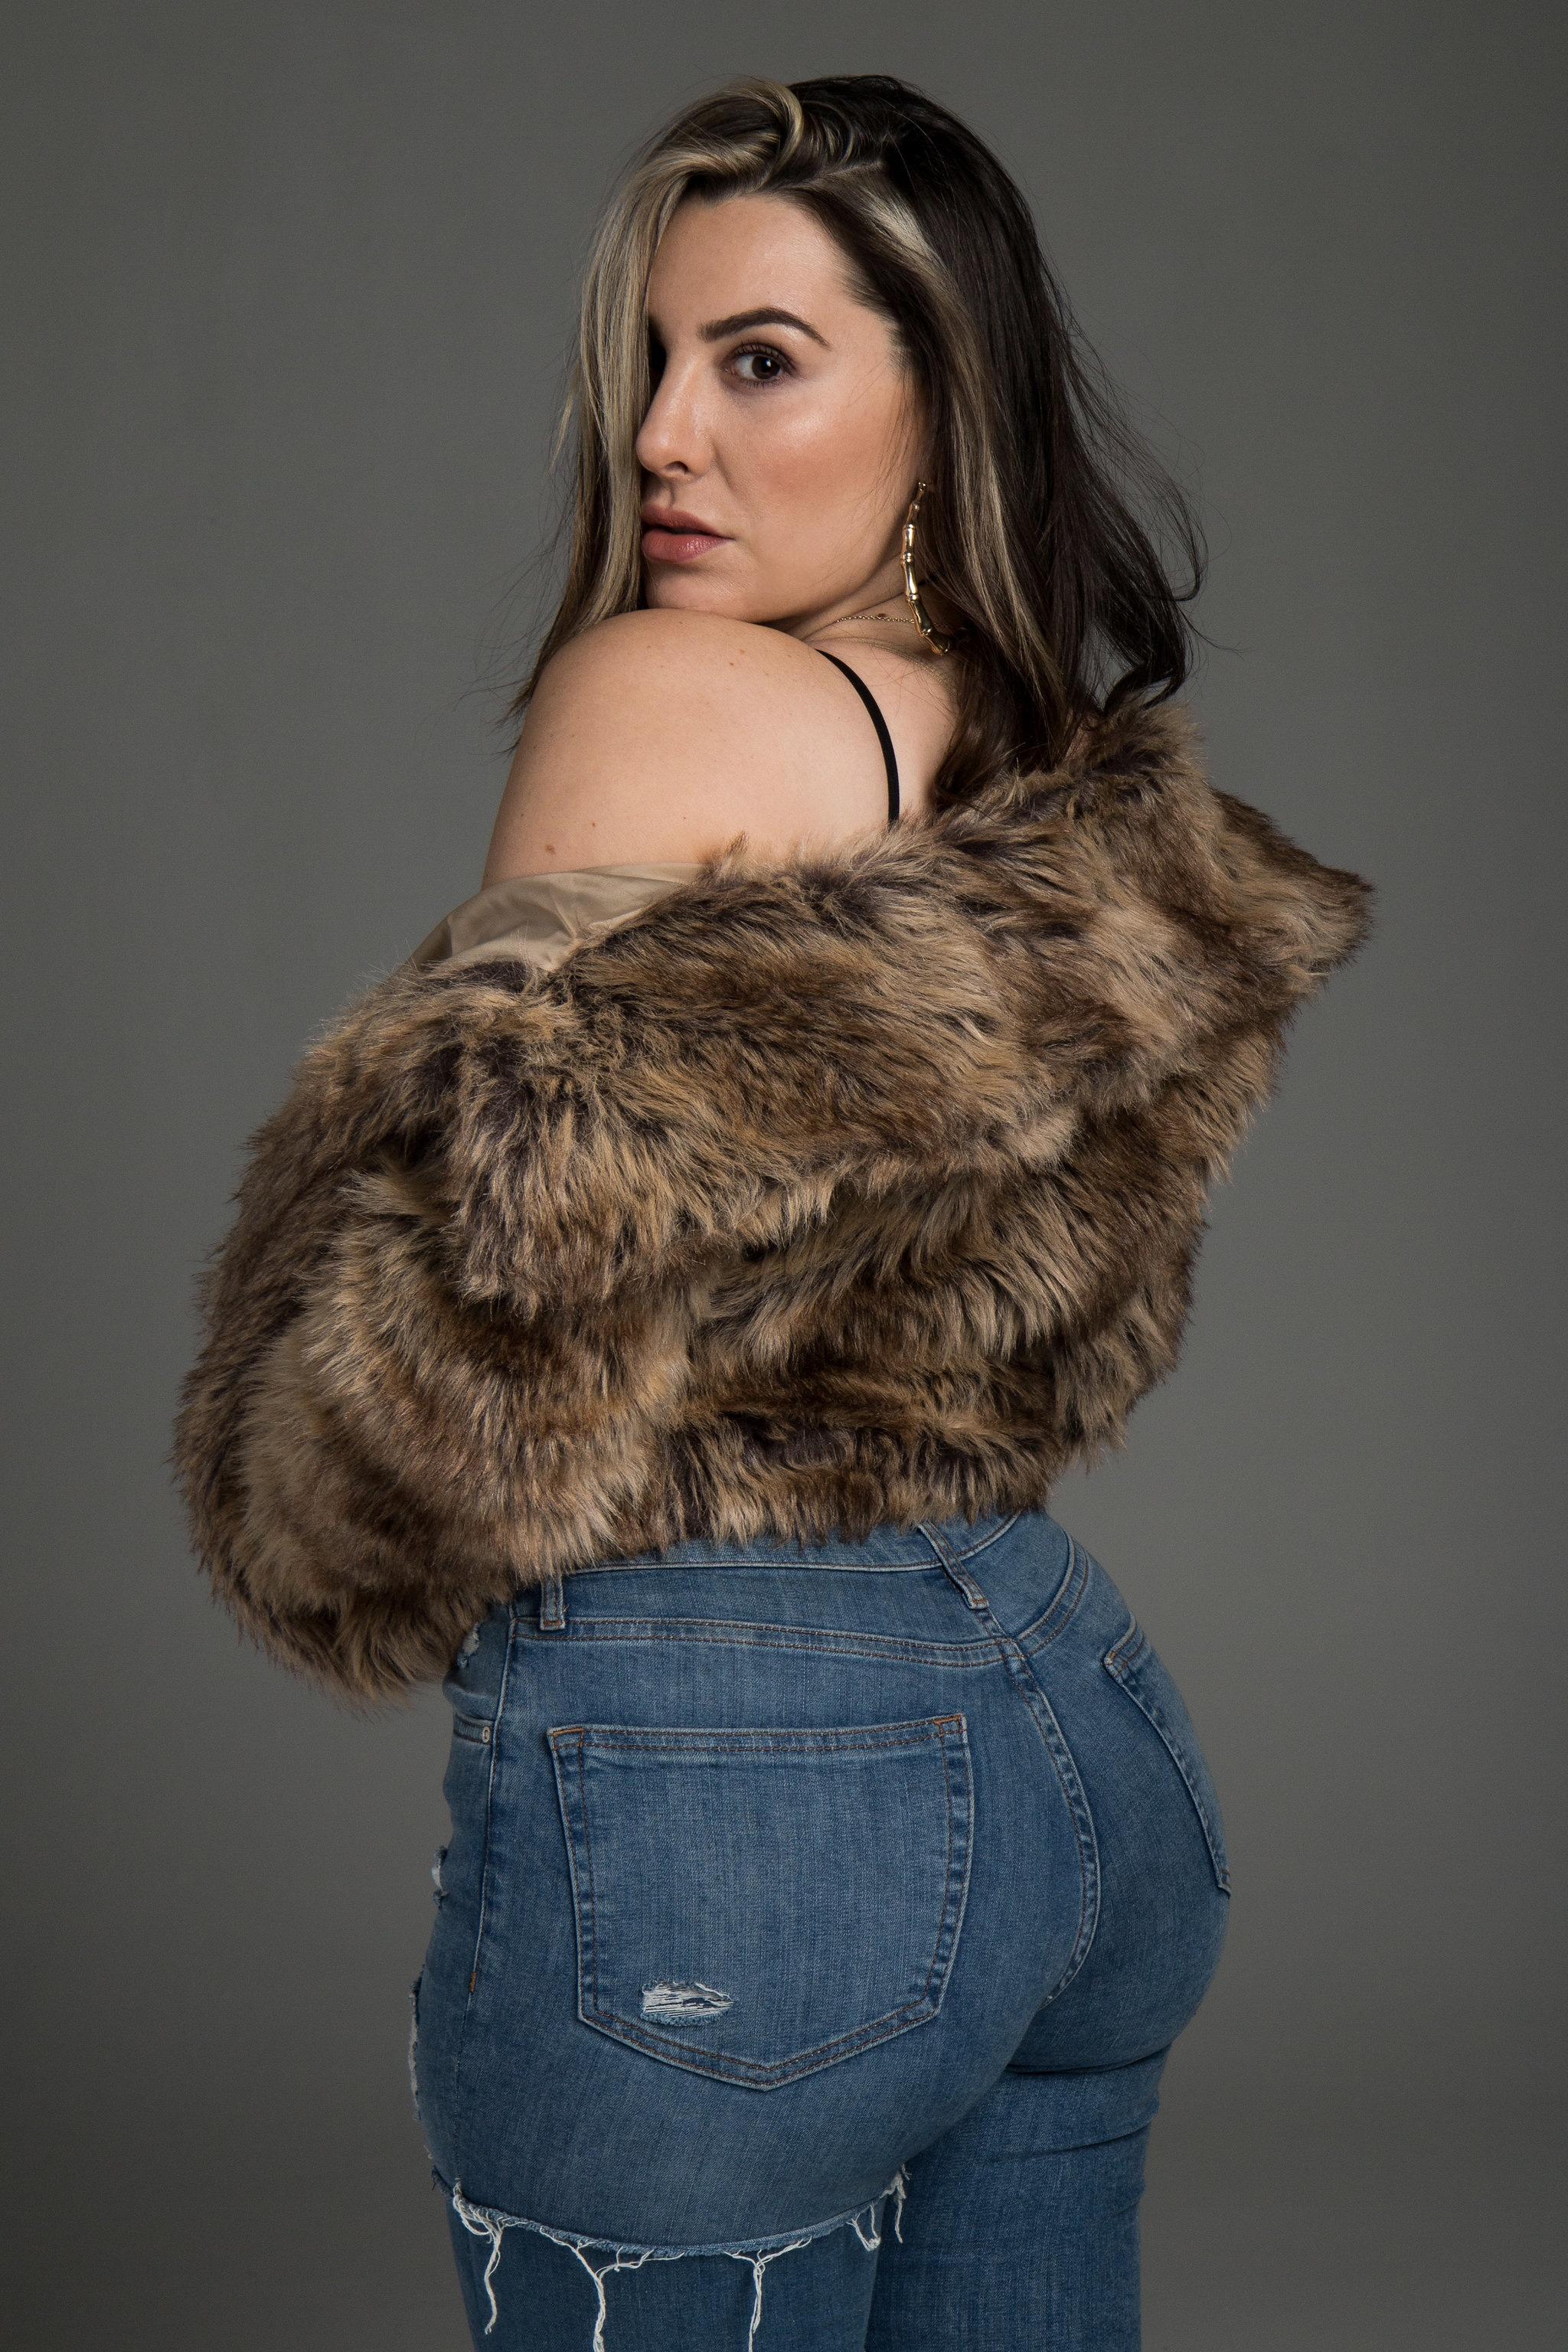 Model:  Lindsay Lucas                                      Photography:   Memo Jimenez   Makeup:  Slater Stanley